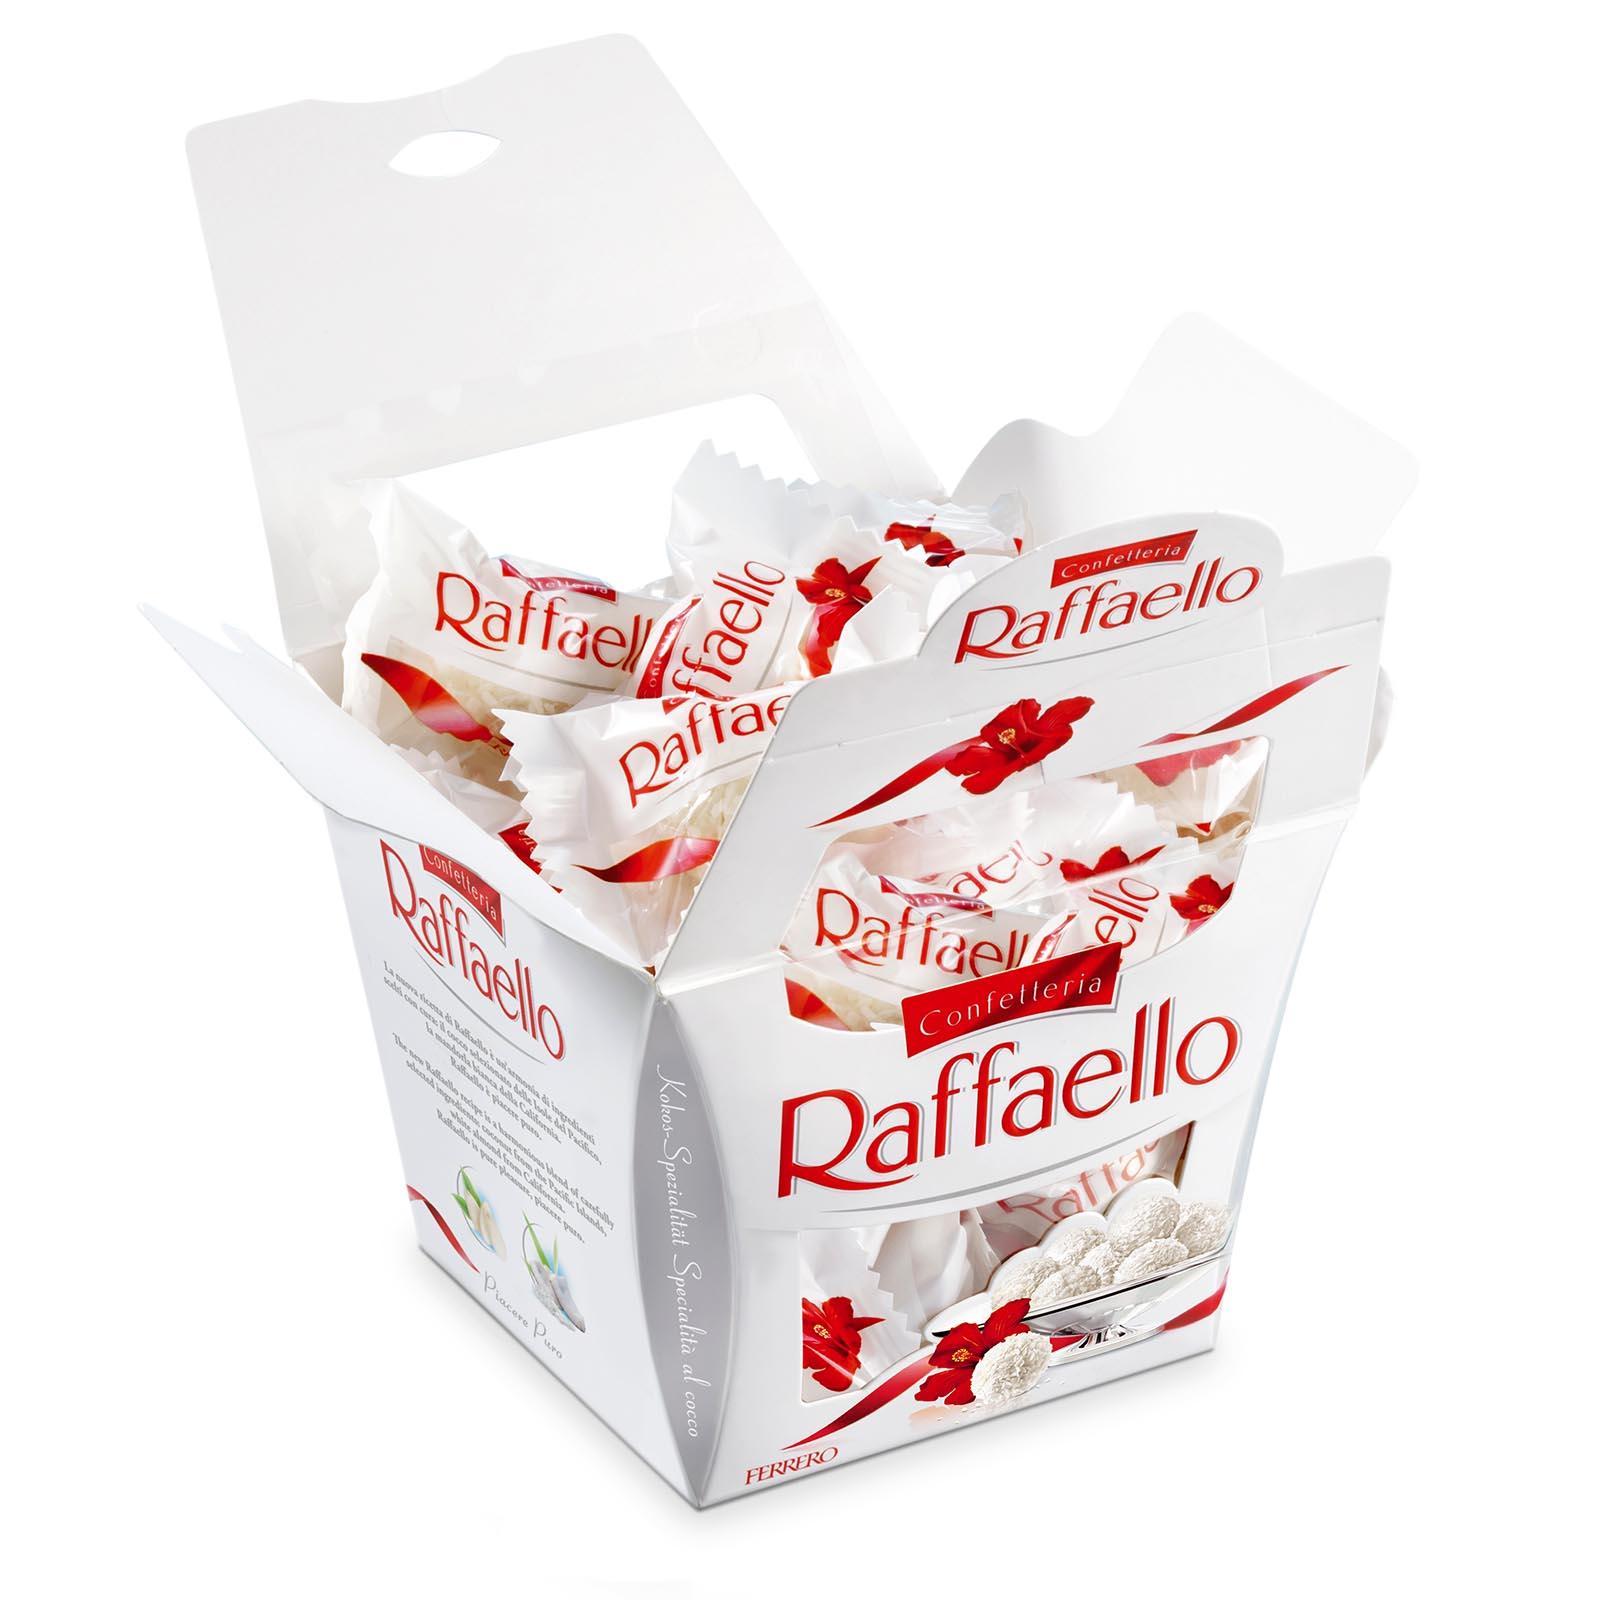 Конфеты Рафаэлло, 15шт/уп., 150г. Raffaello - фото 2